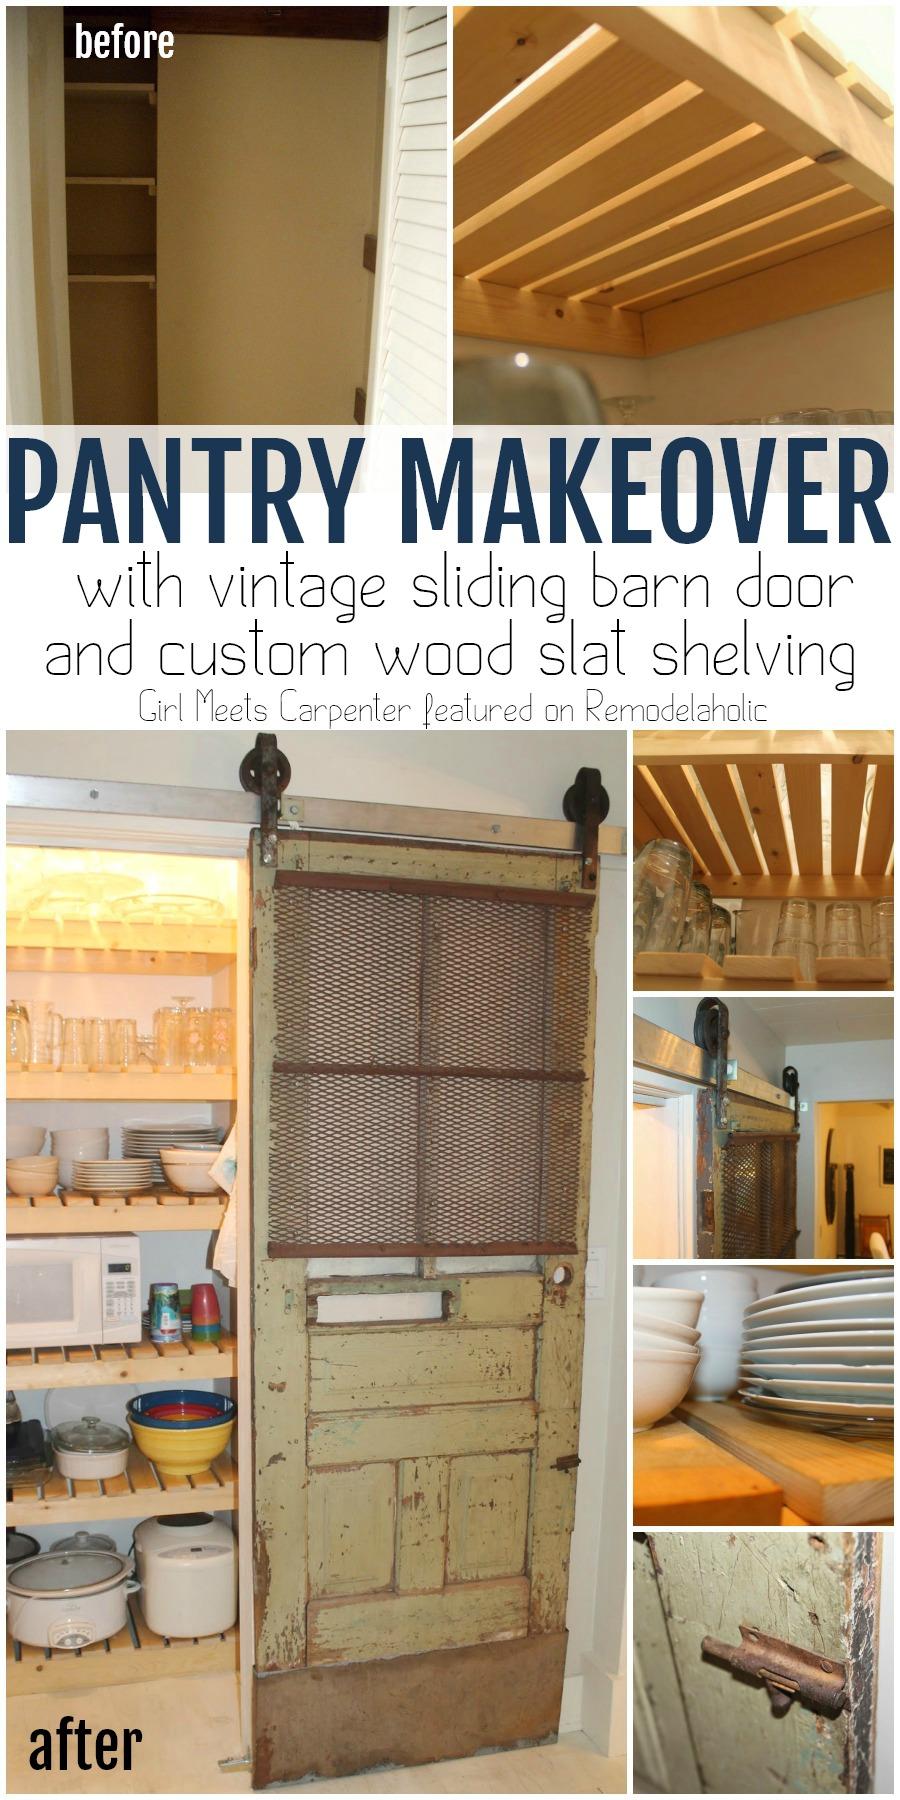 Remodelaholic Sliding Barn Door Pantry Makeover with Wood Slat